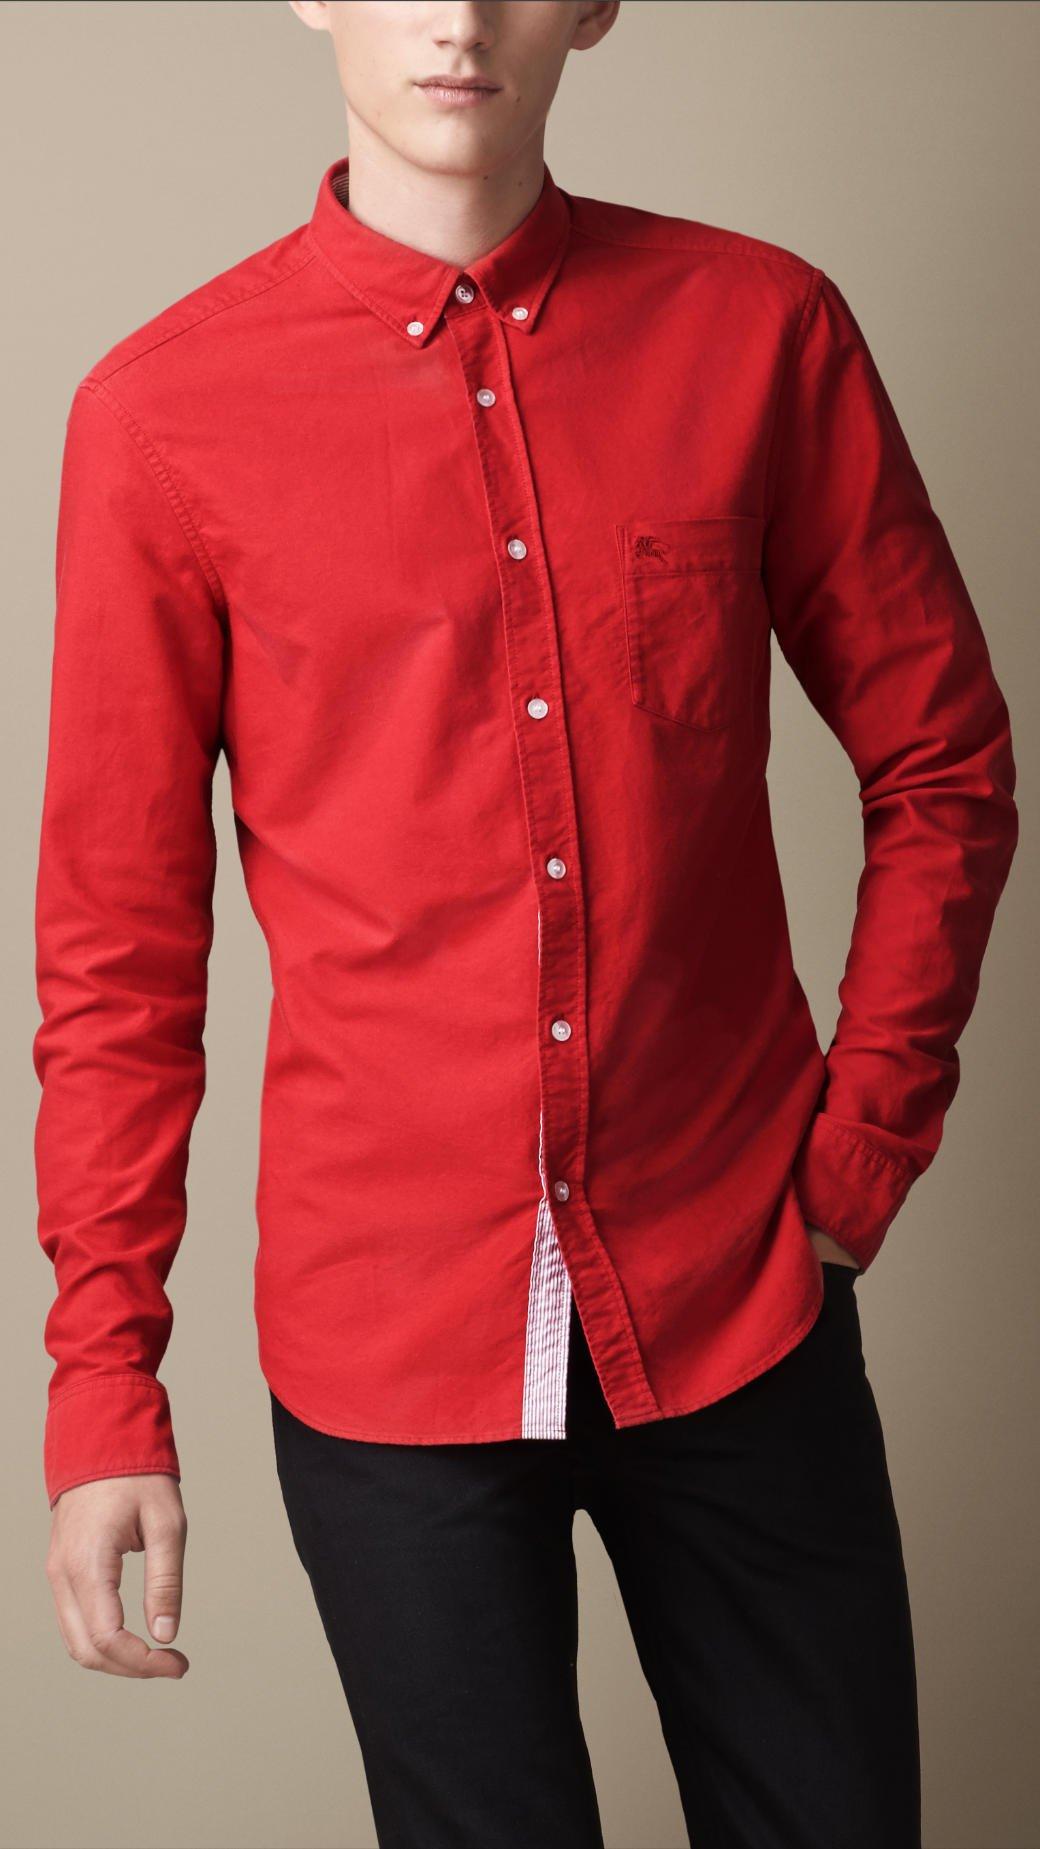 Burberry Buttondown Collar Cotton Shirt In Red For Men Lyst